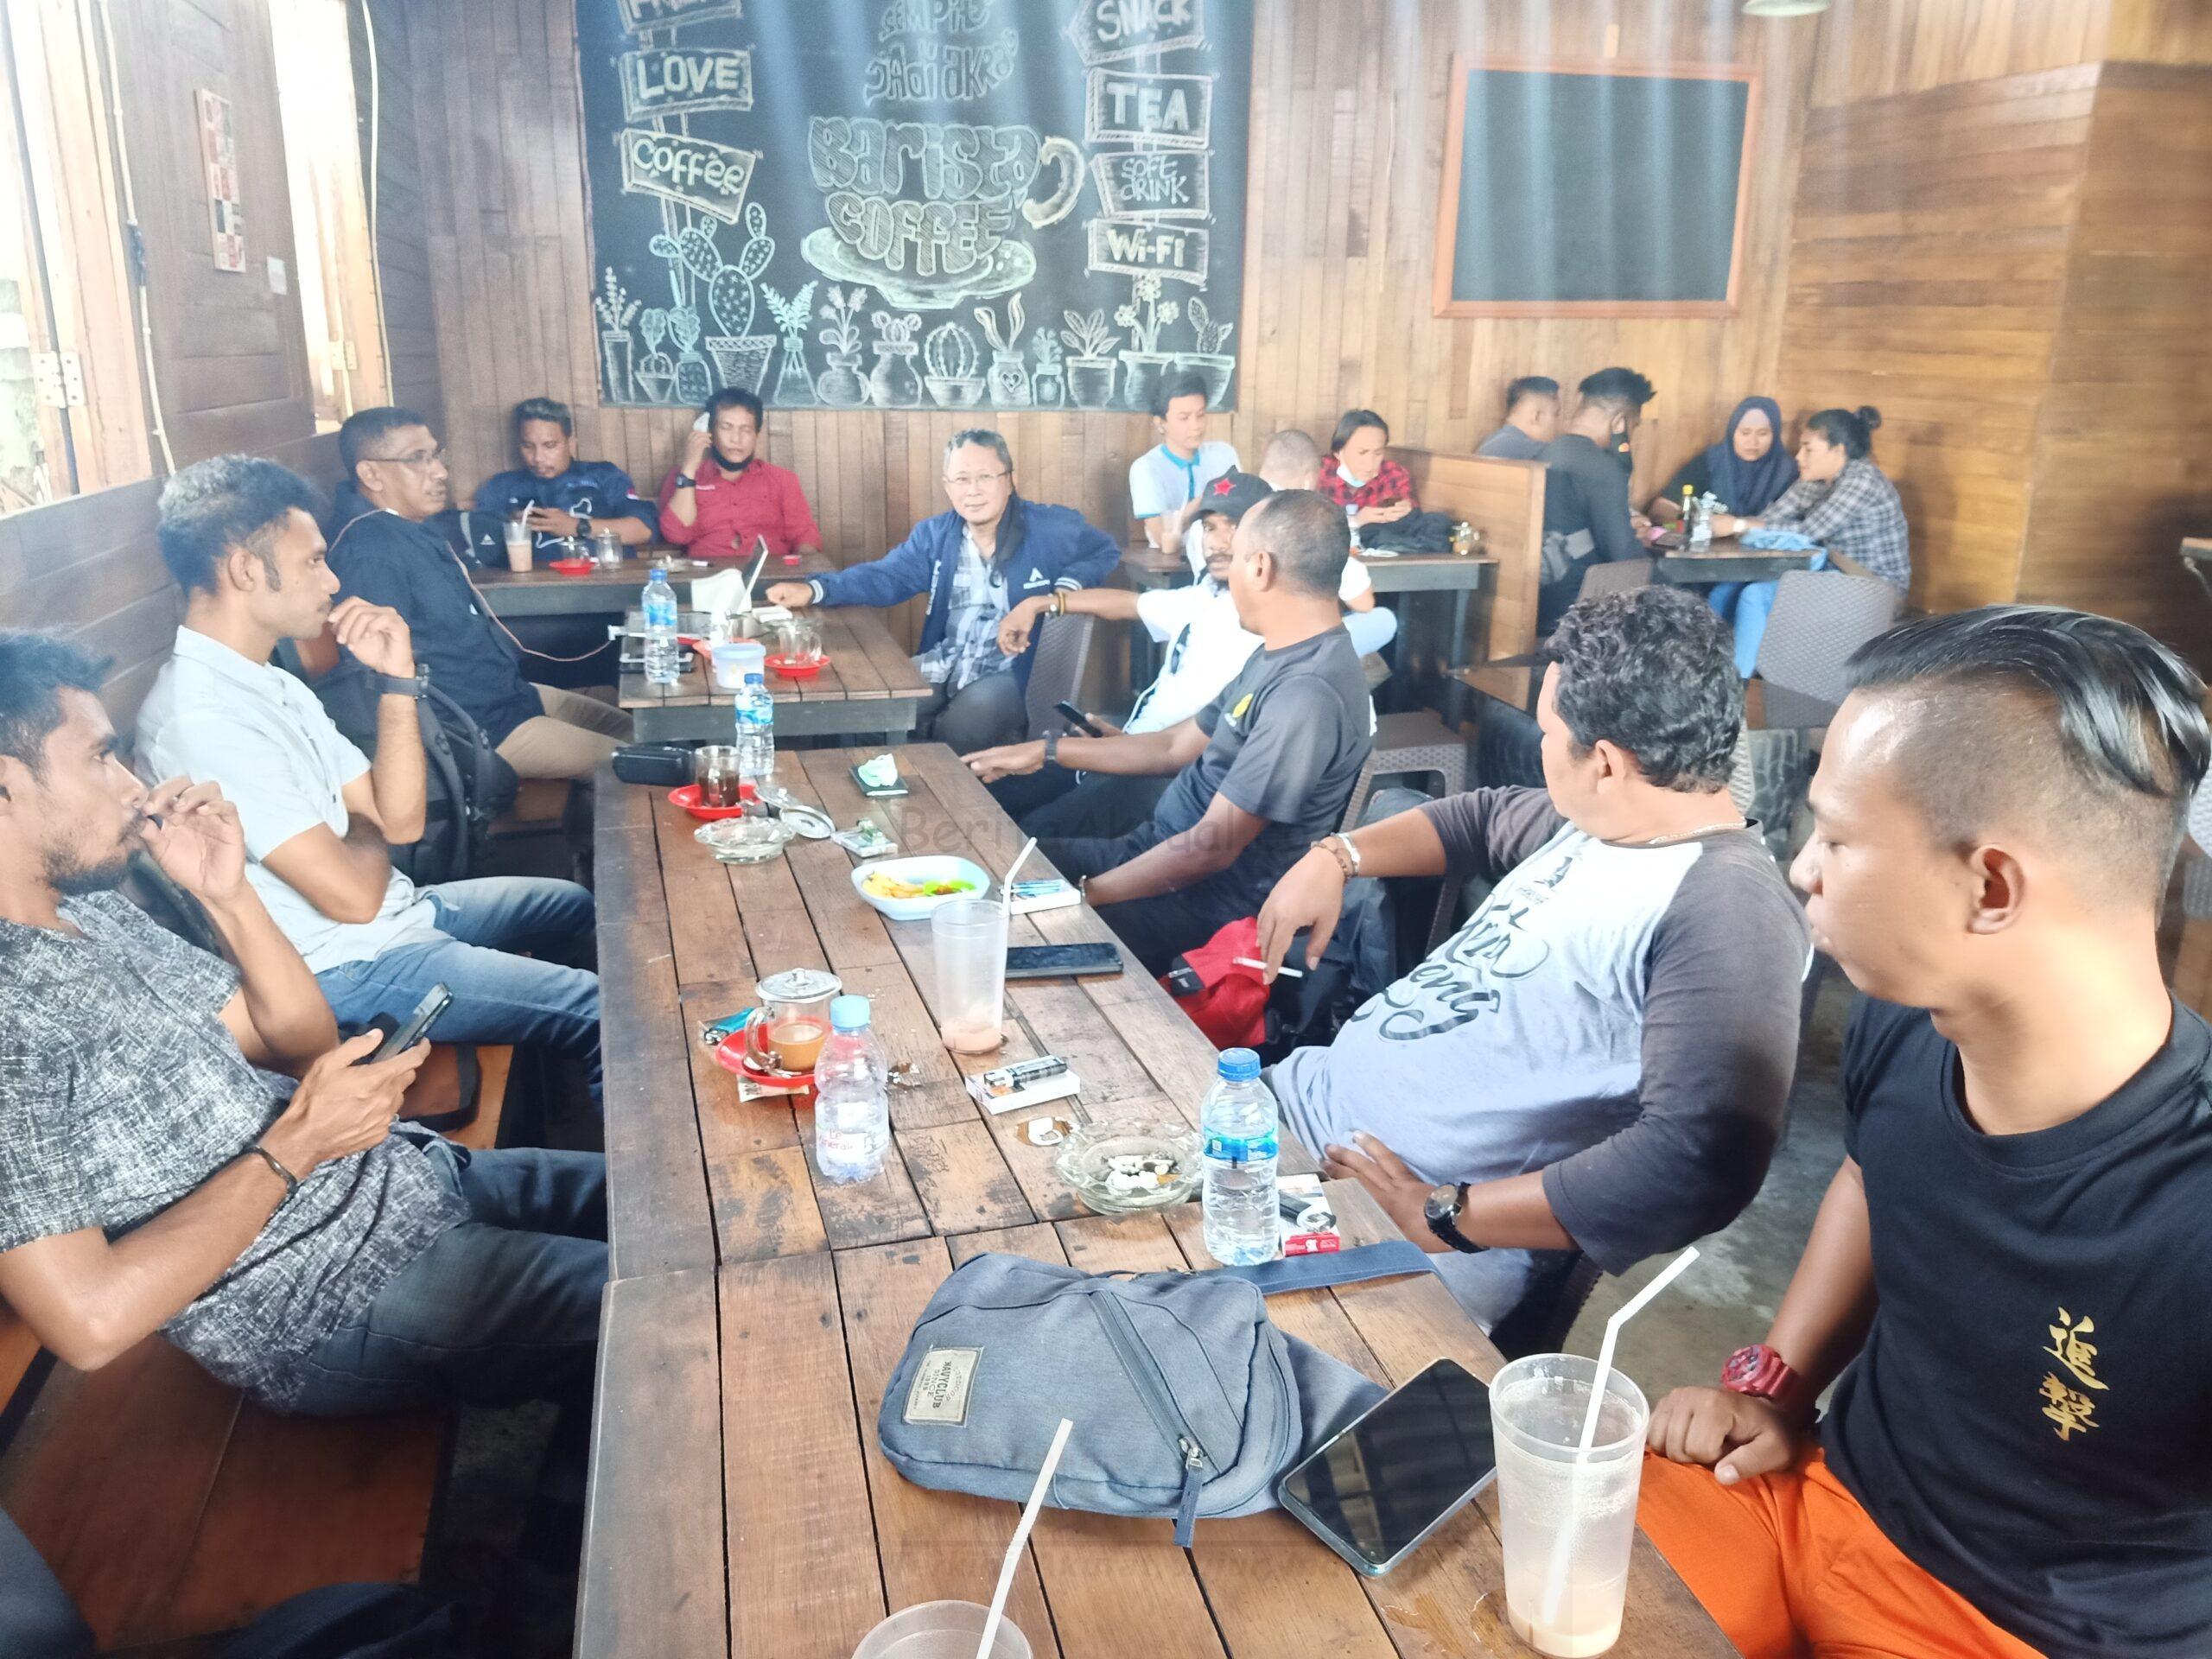 Basarnas Manokwari Coffee Break Bersama Insan Pers 16 IMG20210315162239 scaled